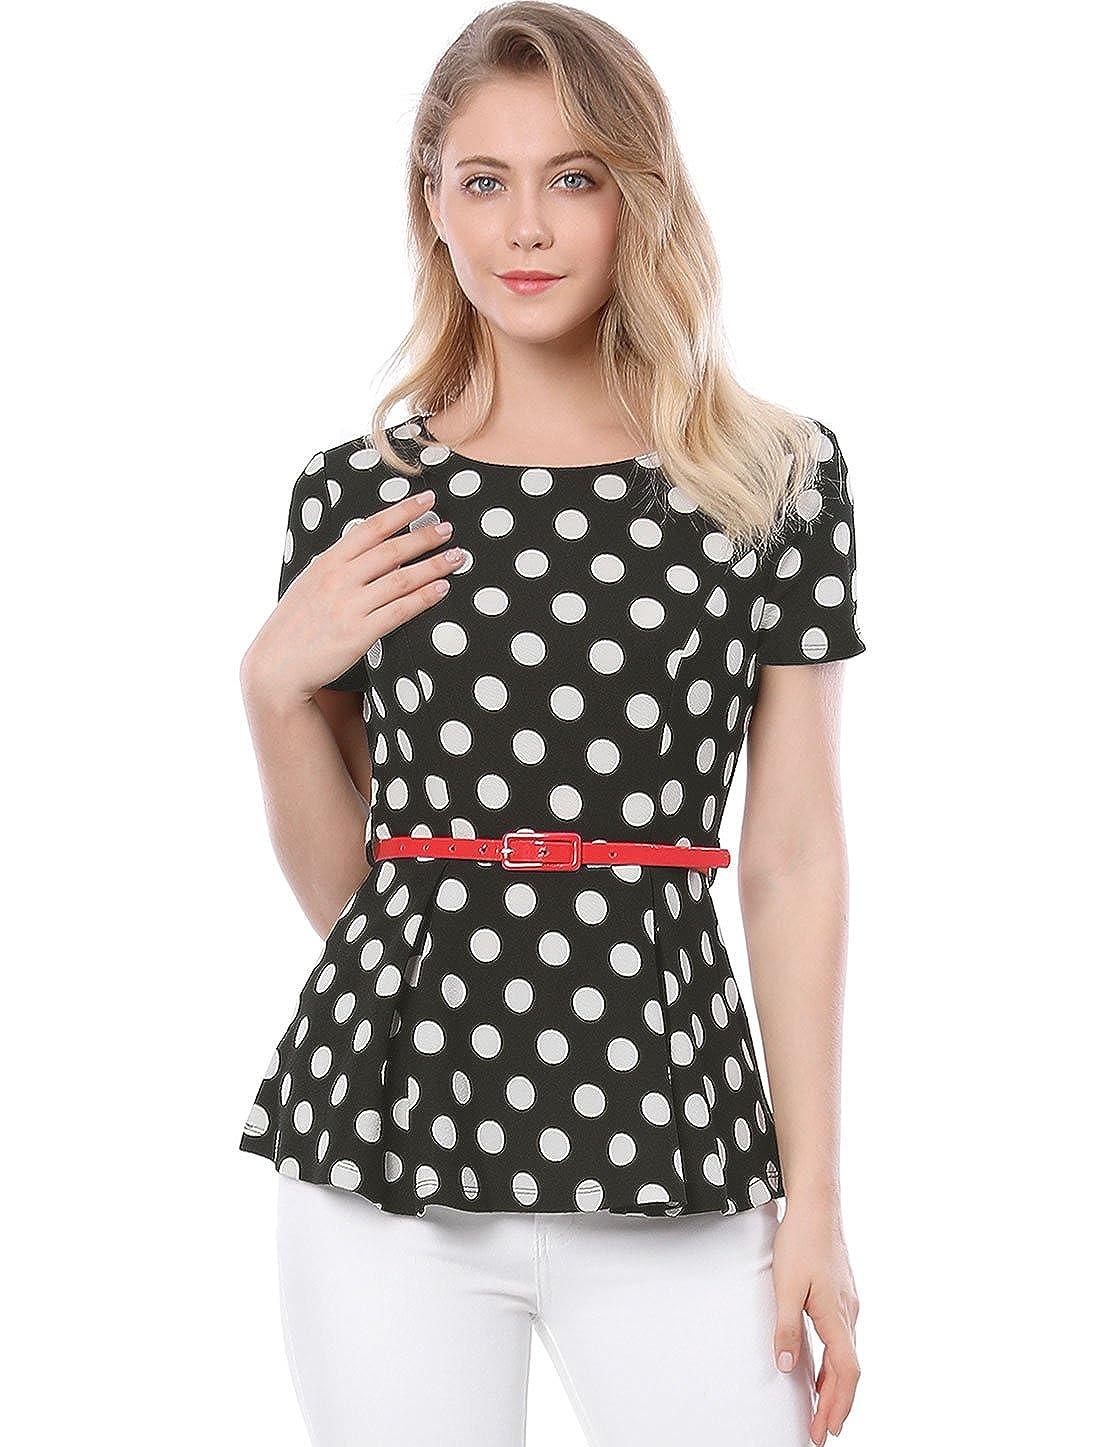 1303383c94be7 Allegra K Women s Summer Short Sleeve Polka Dot Peplum Top with Belt at  Amazon Women s Clothing store